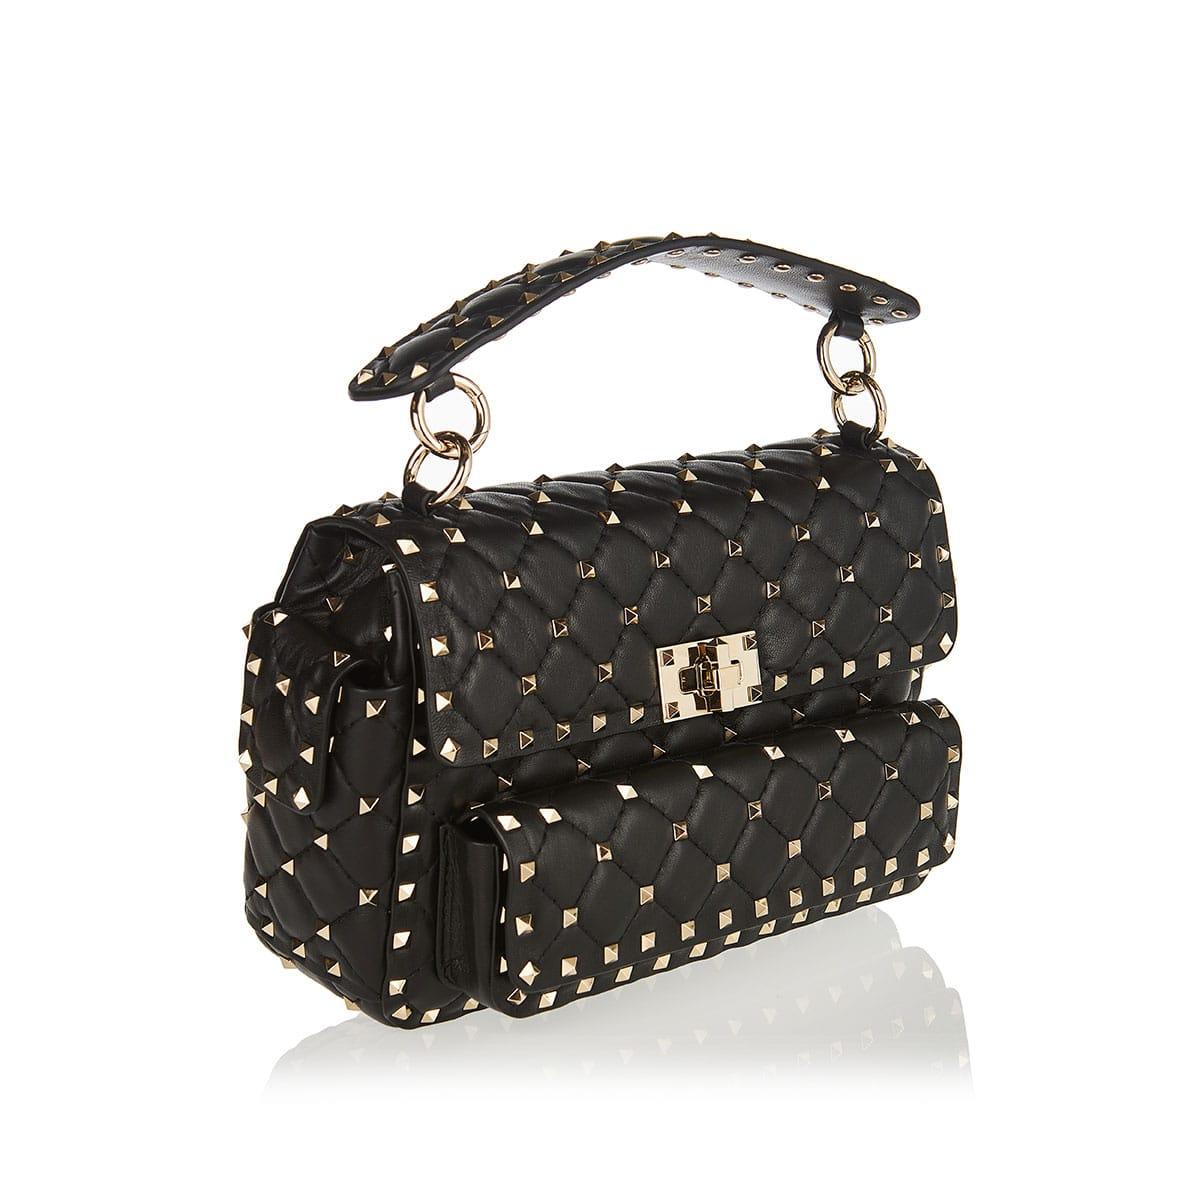 Rockstud Spike medium bag with pockets